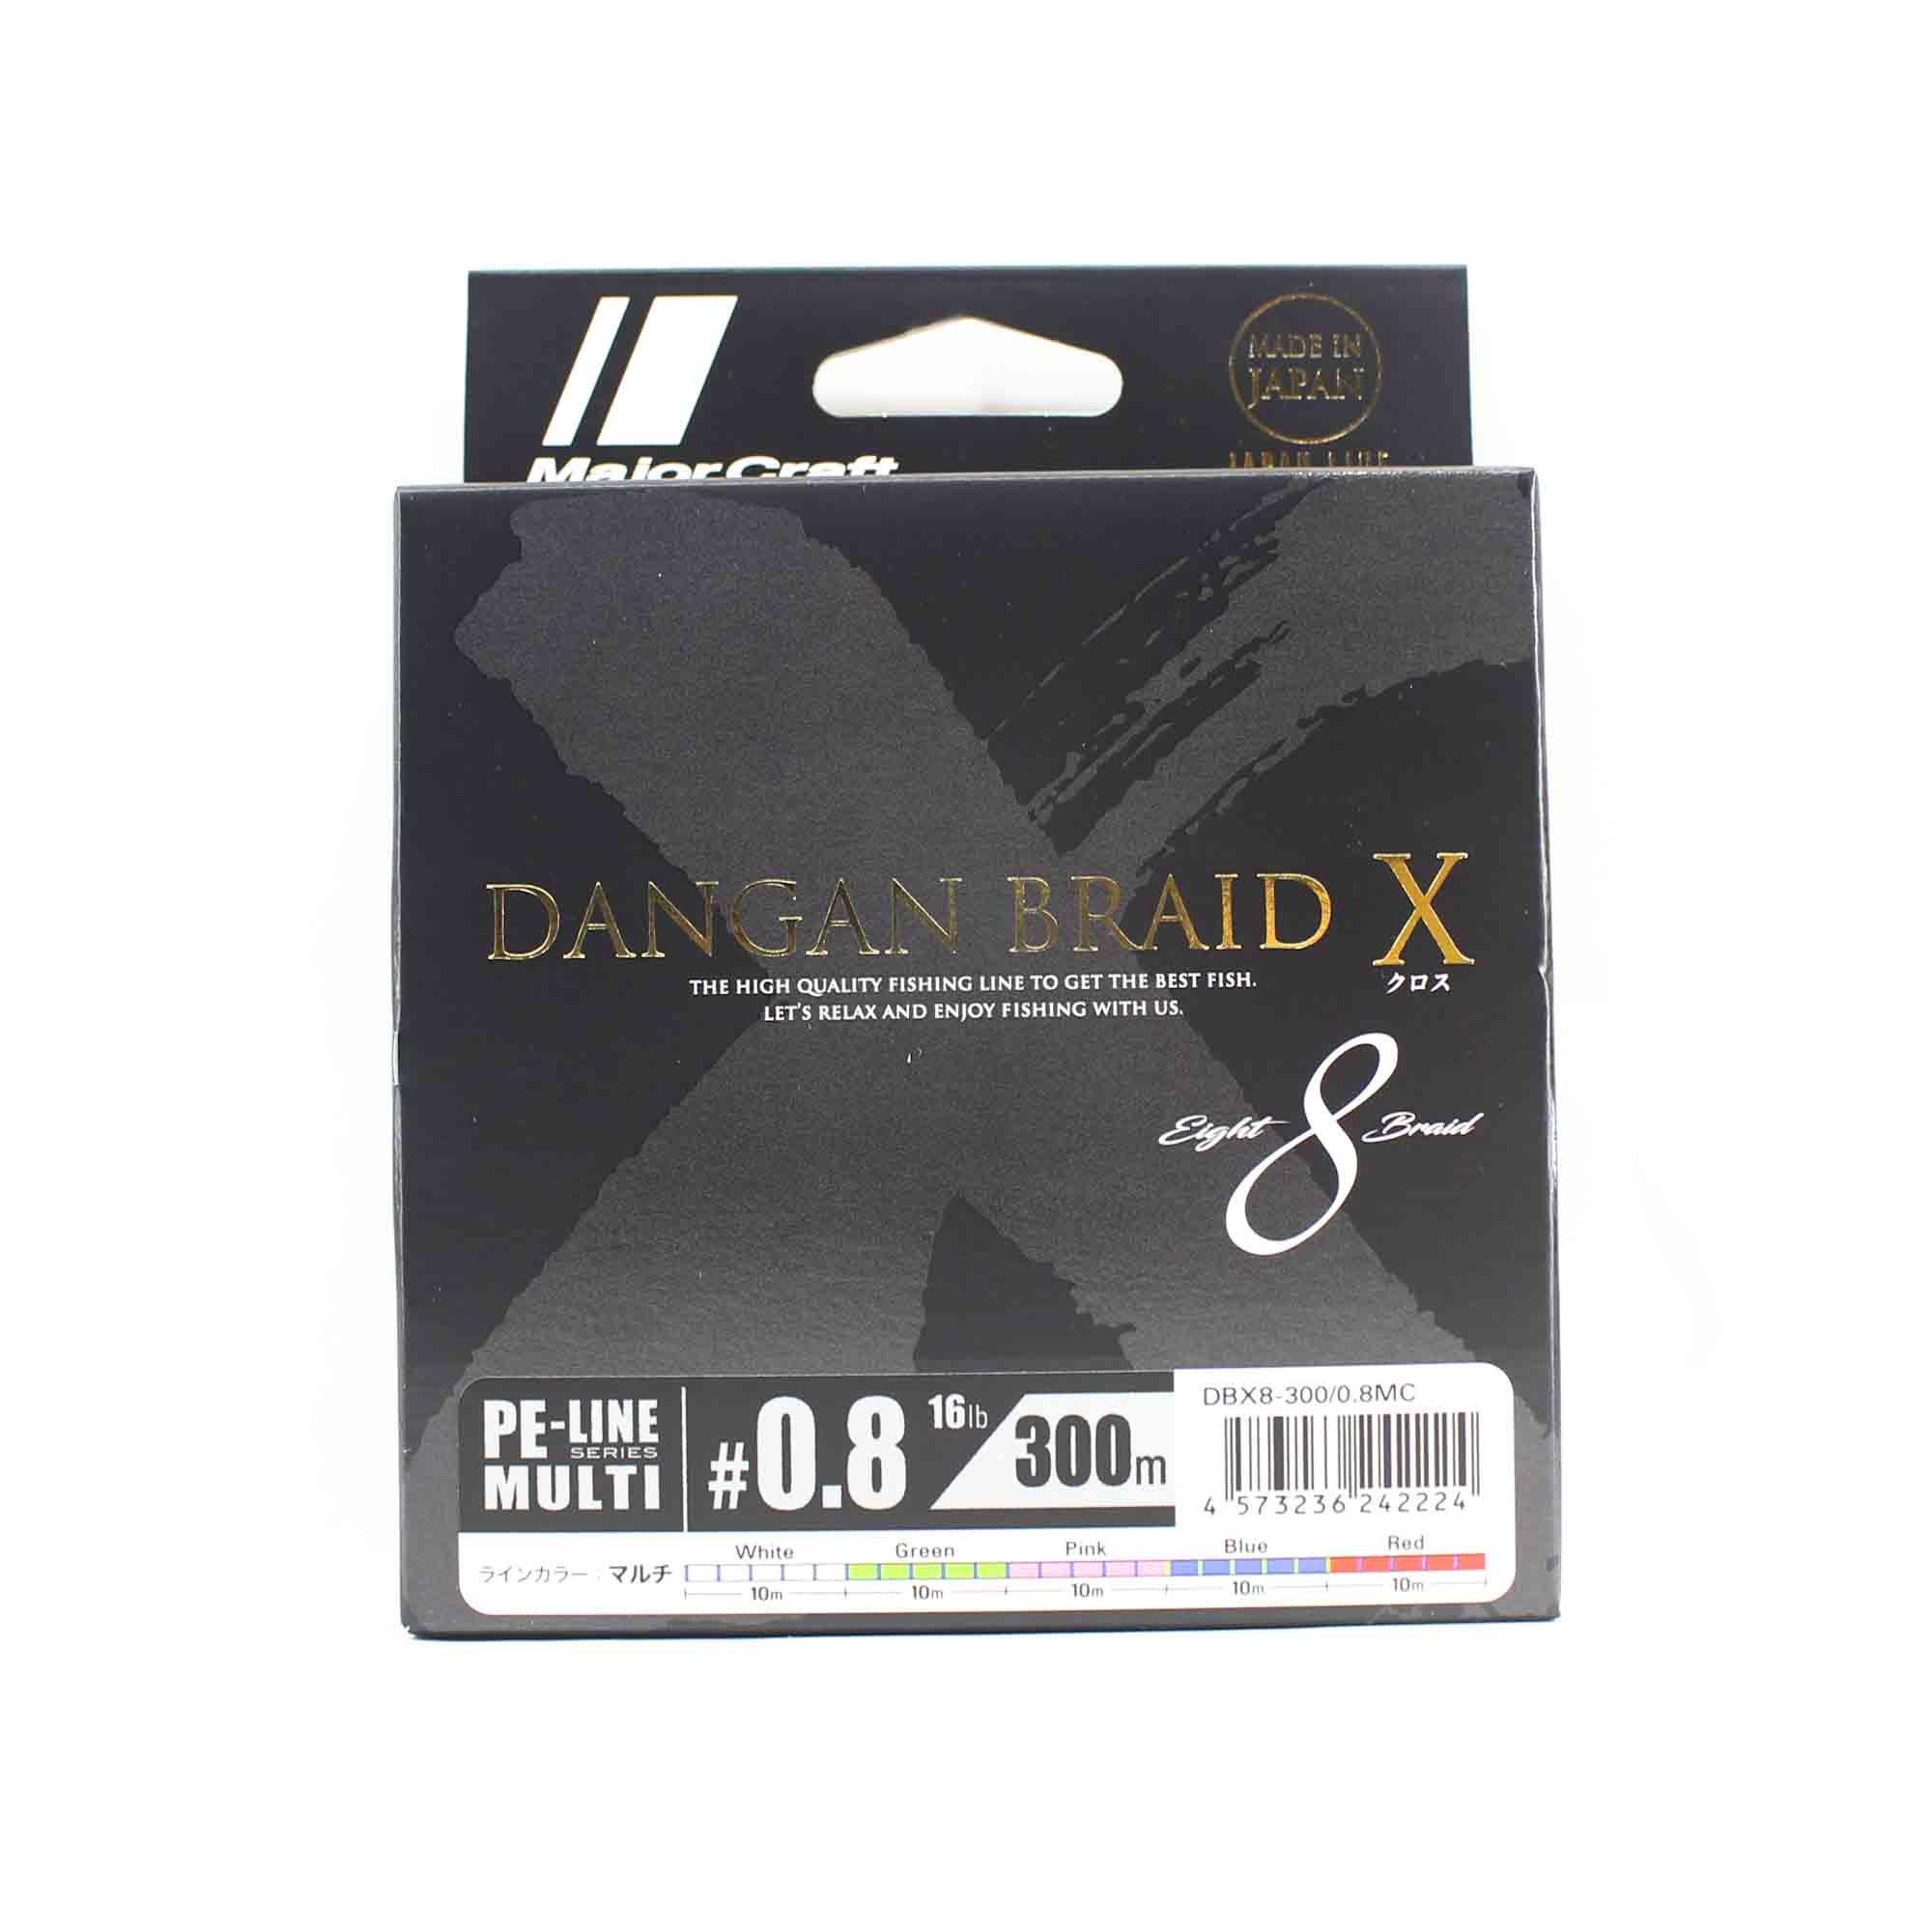 Major Craft Dangan Braid X Line X8 300m P.E 0.8 Multi DBX8-300/0.8MC (2224)